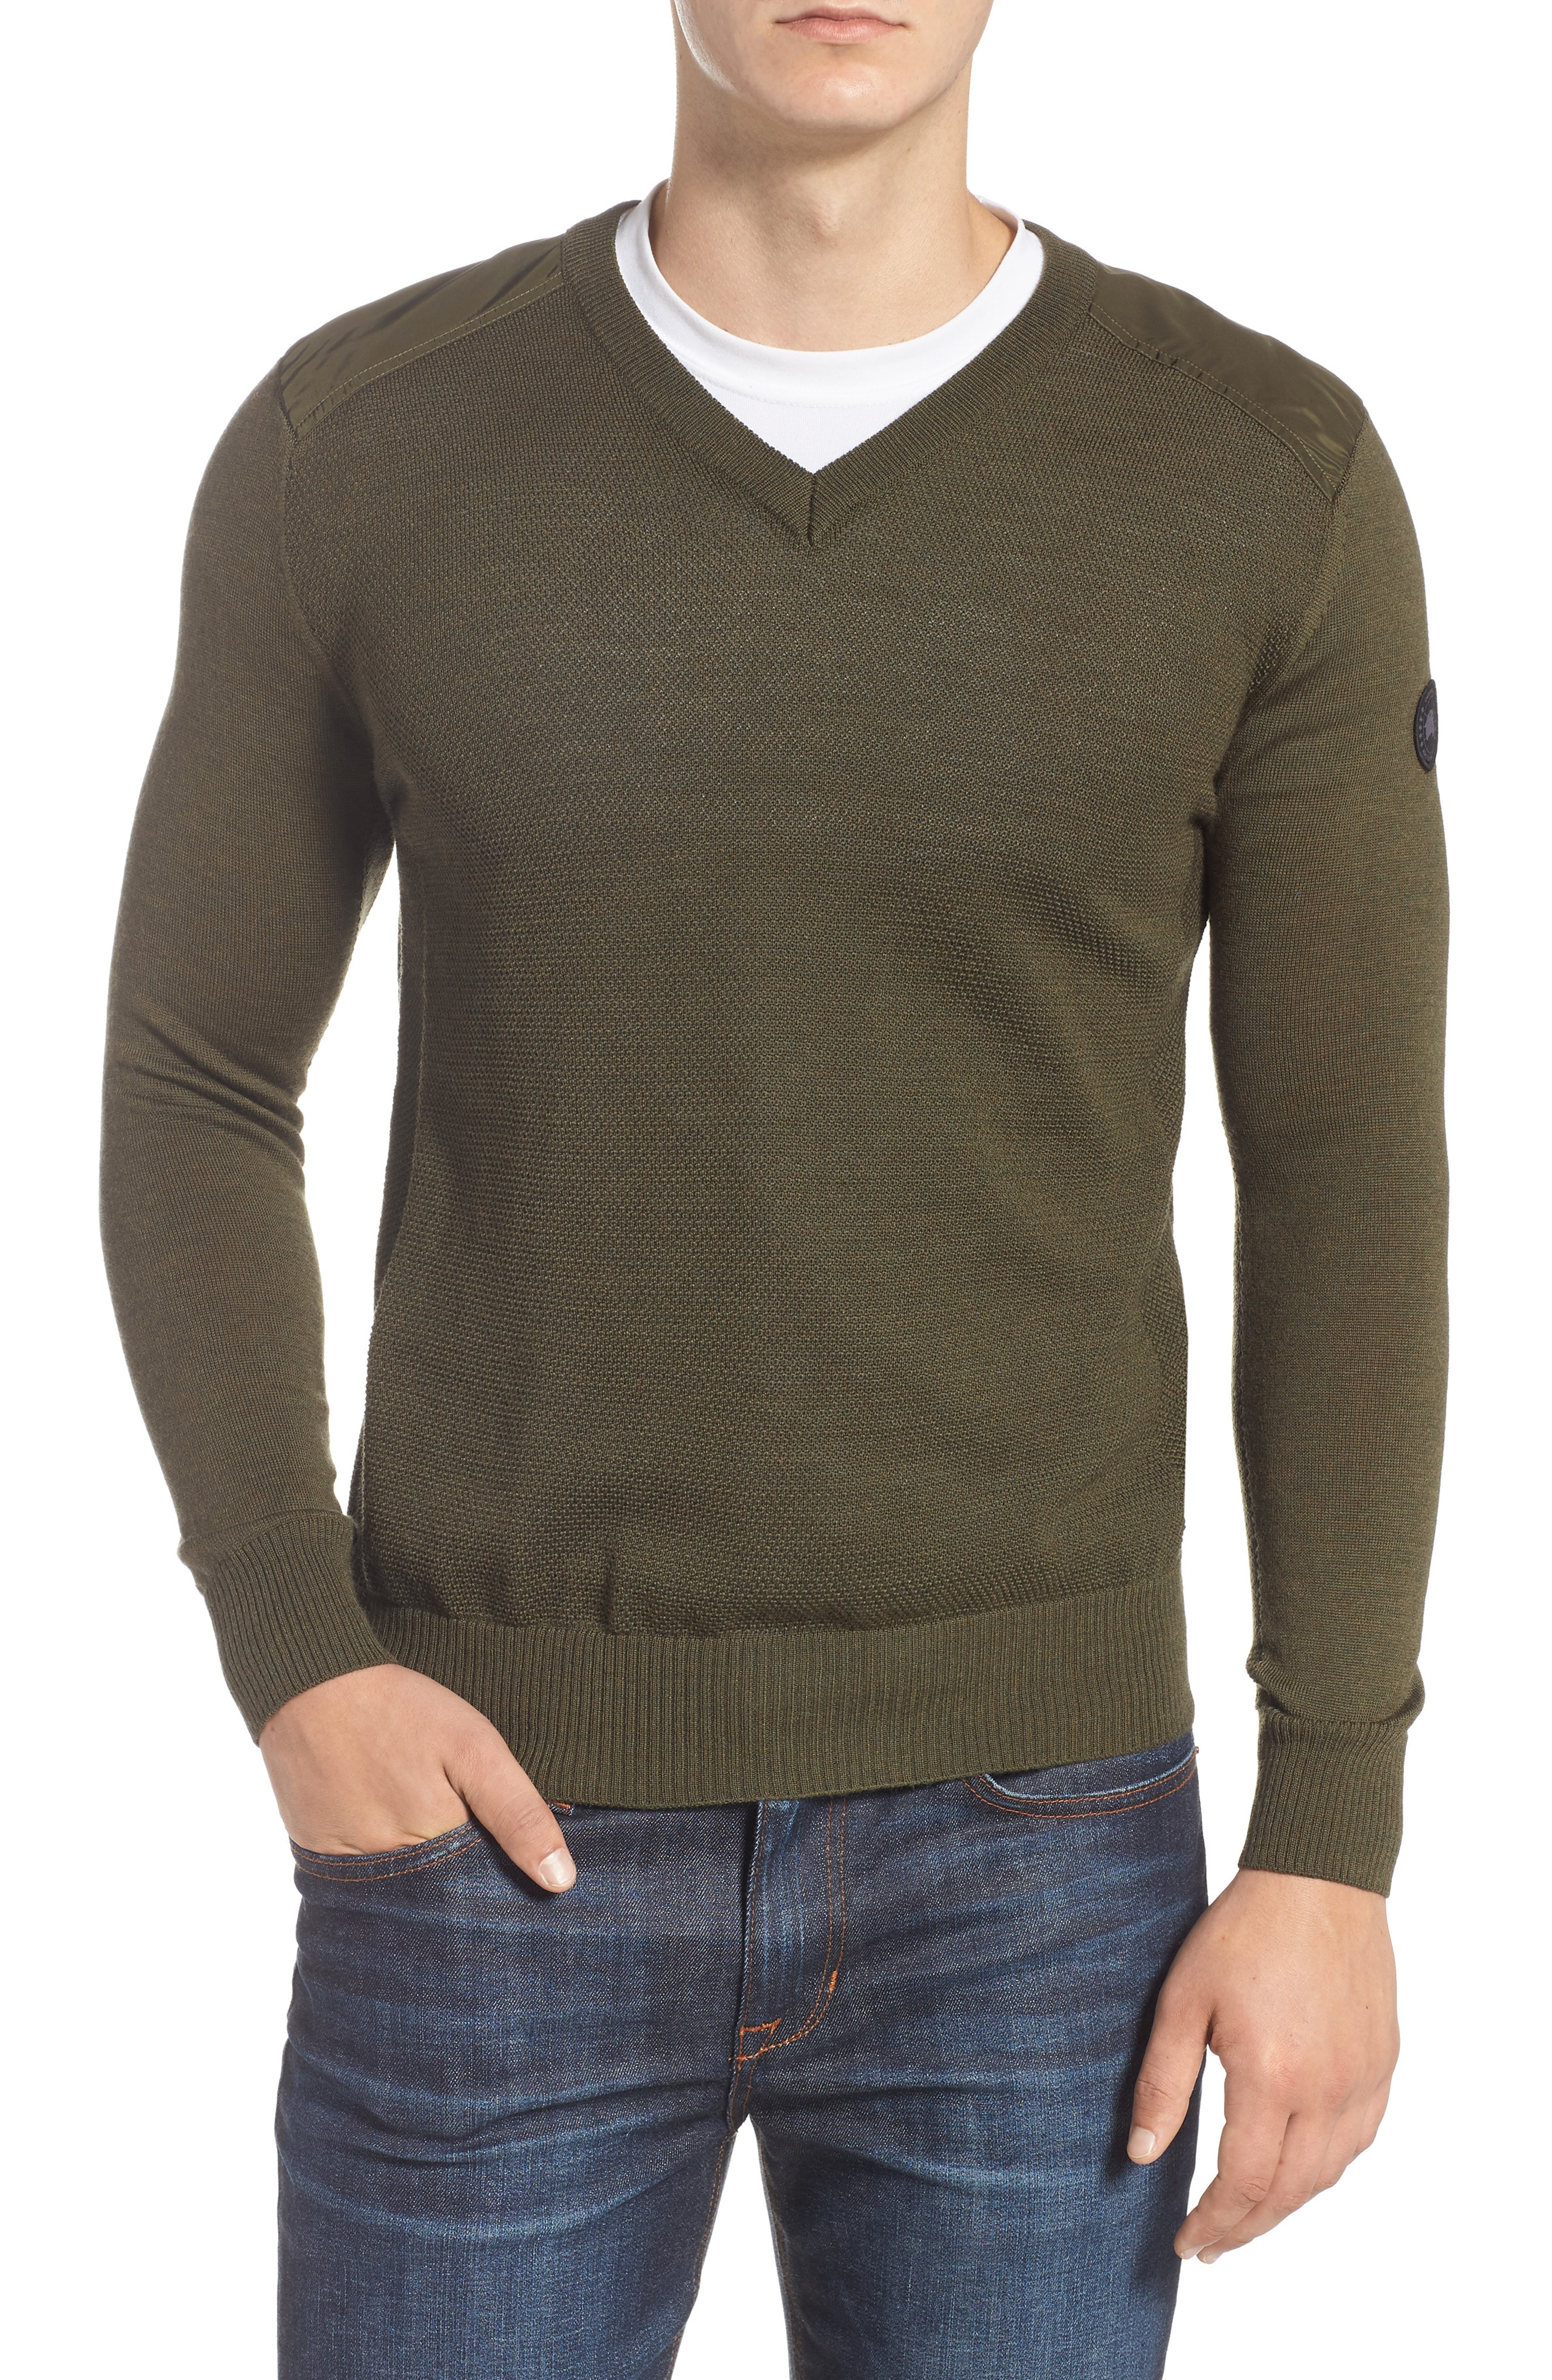 Canada Goose McLeod V-Neck Regular Fit Merino Wool Sweater